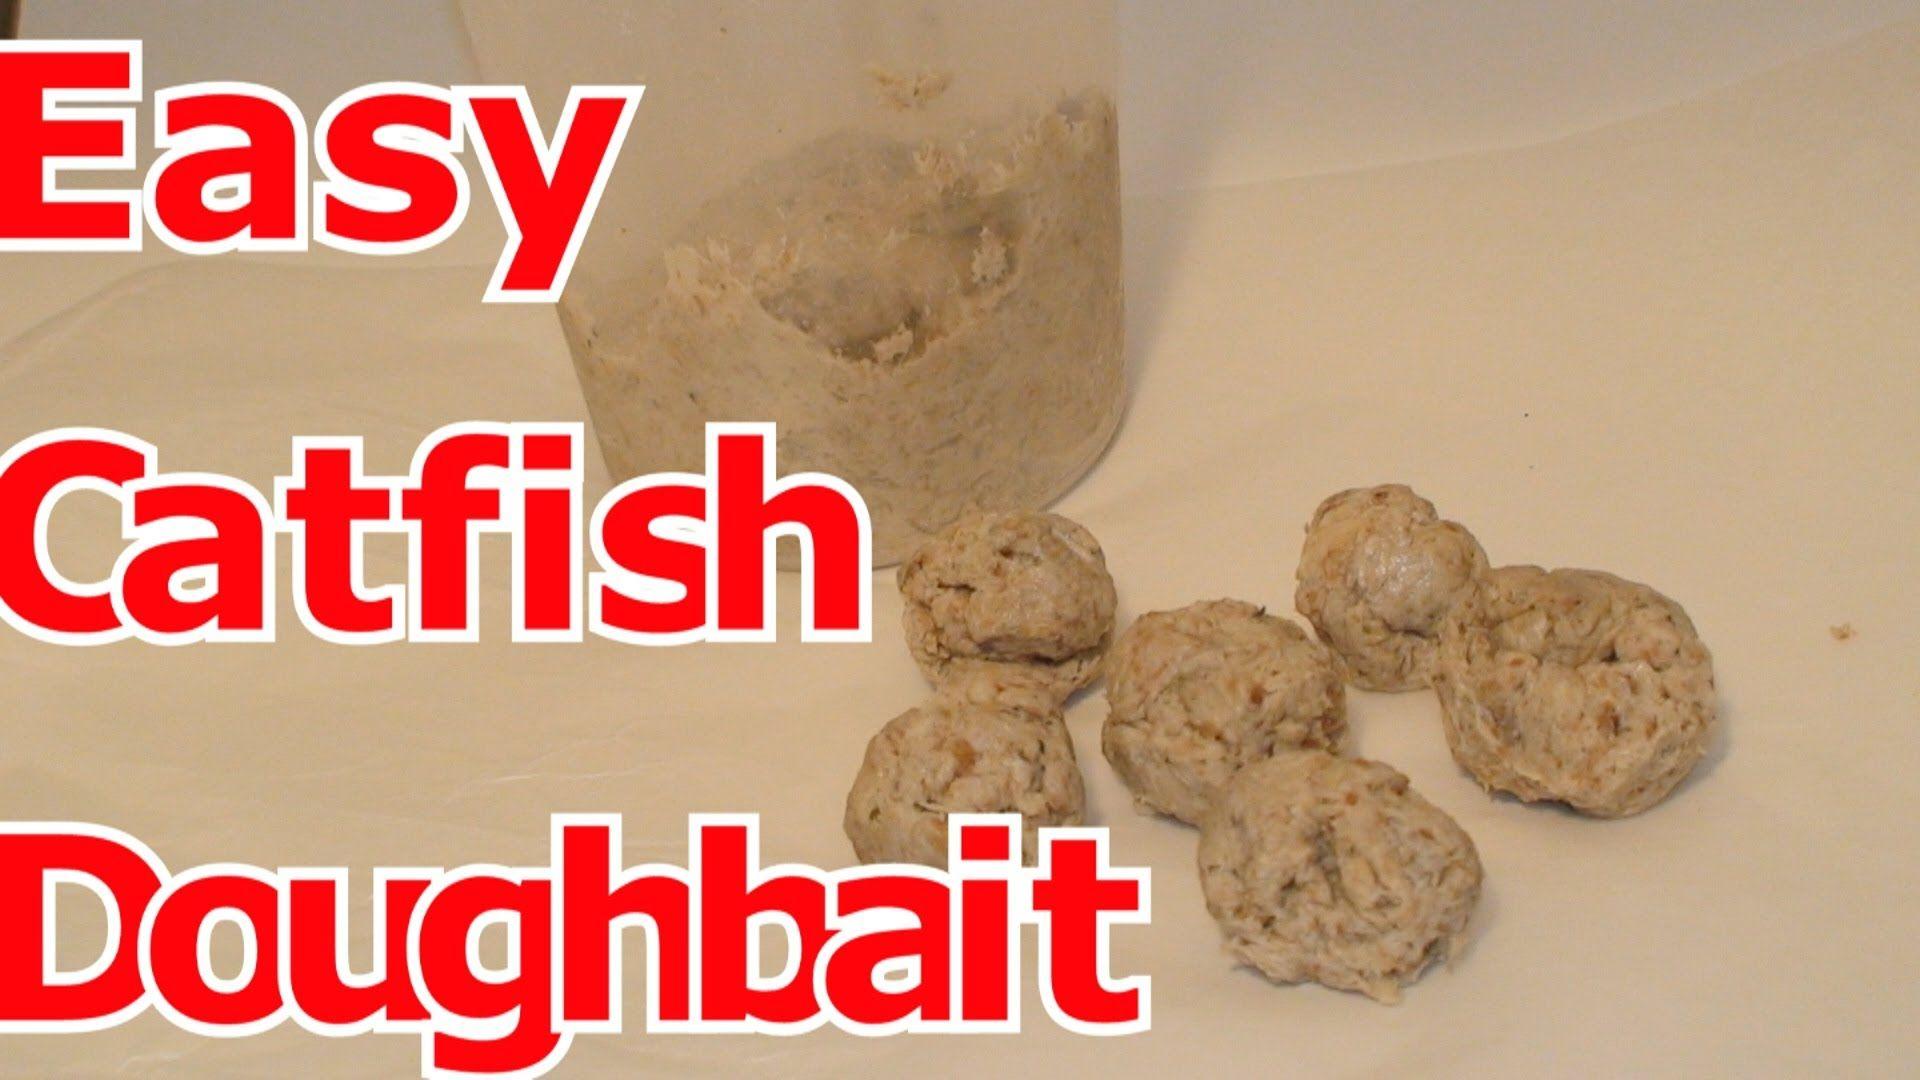 Catfish stink bait recipe